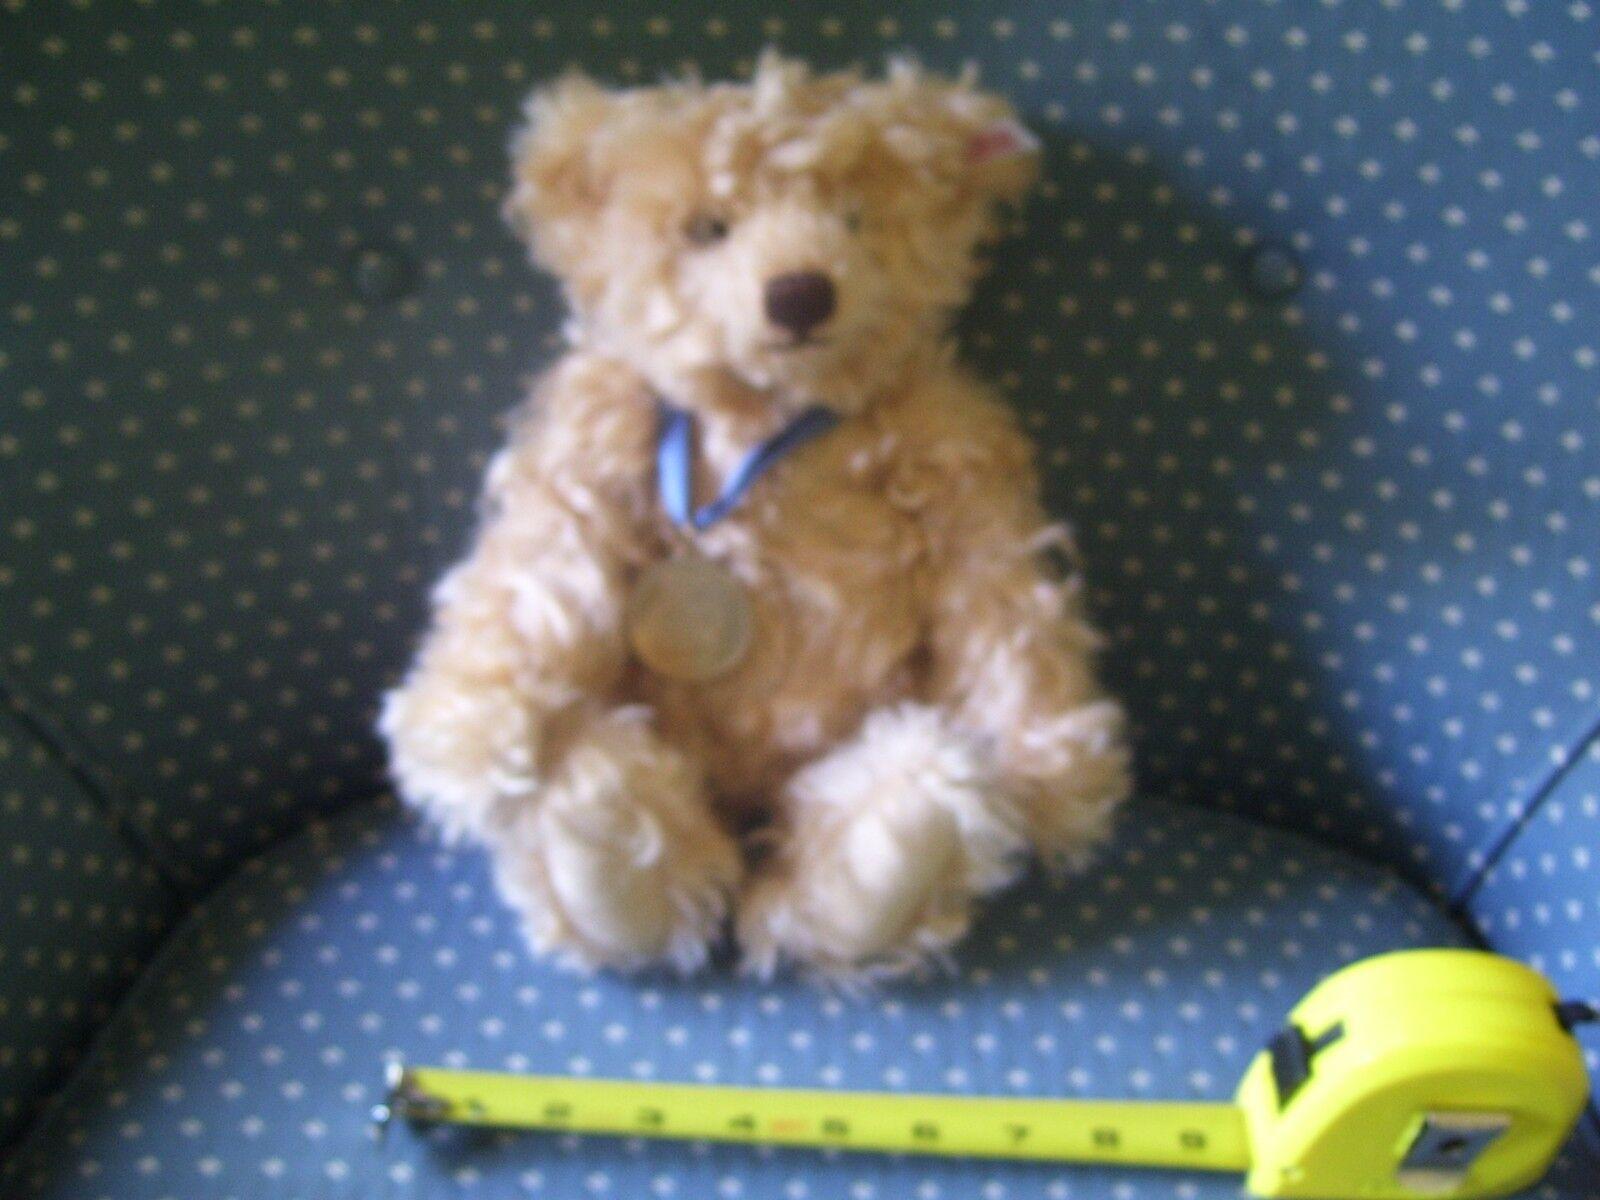 Steiff 2008 Danbury Mint Exclusive Classic Jointed Teddy Bear, Light marrone